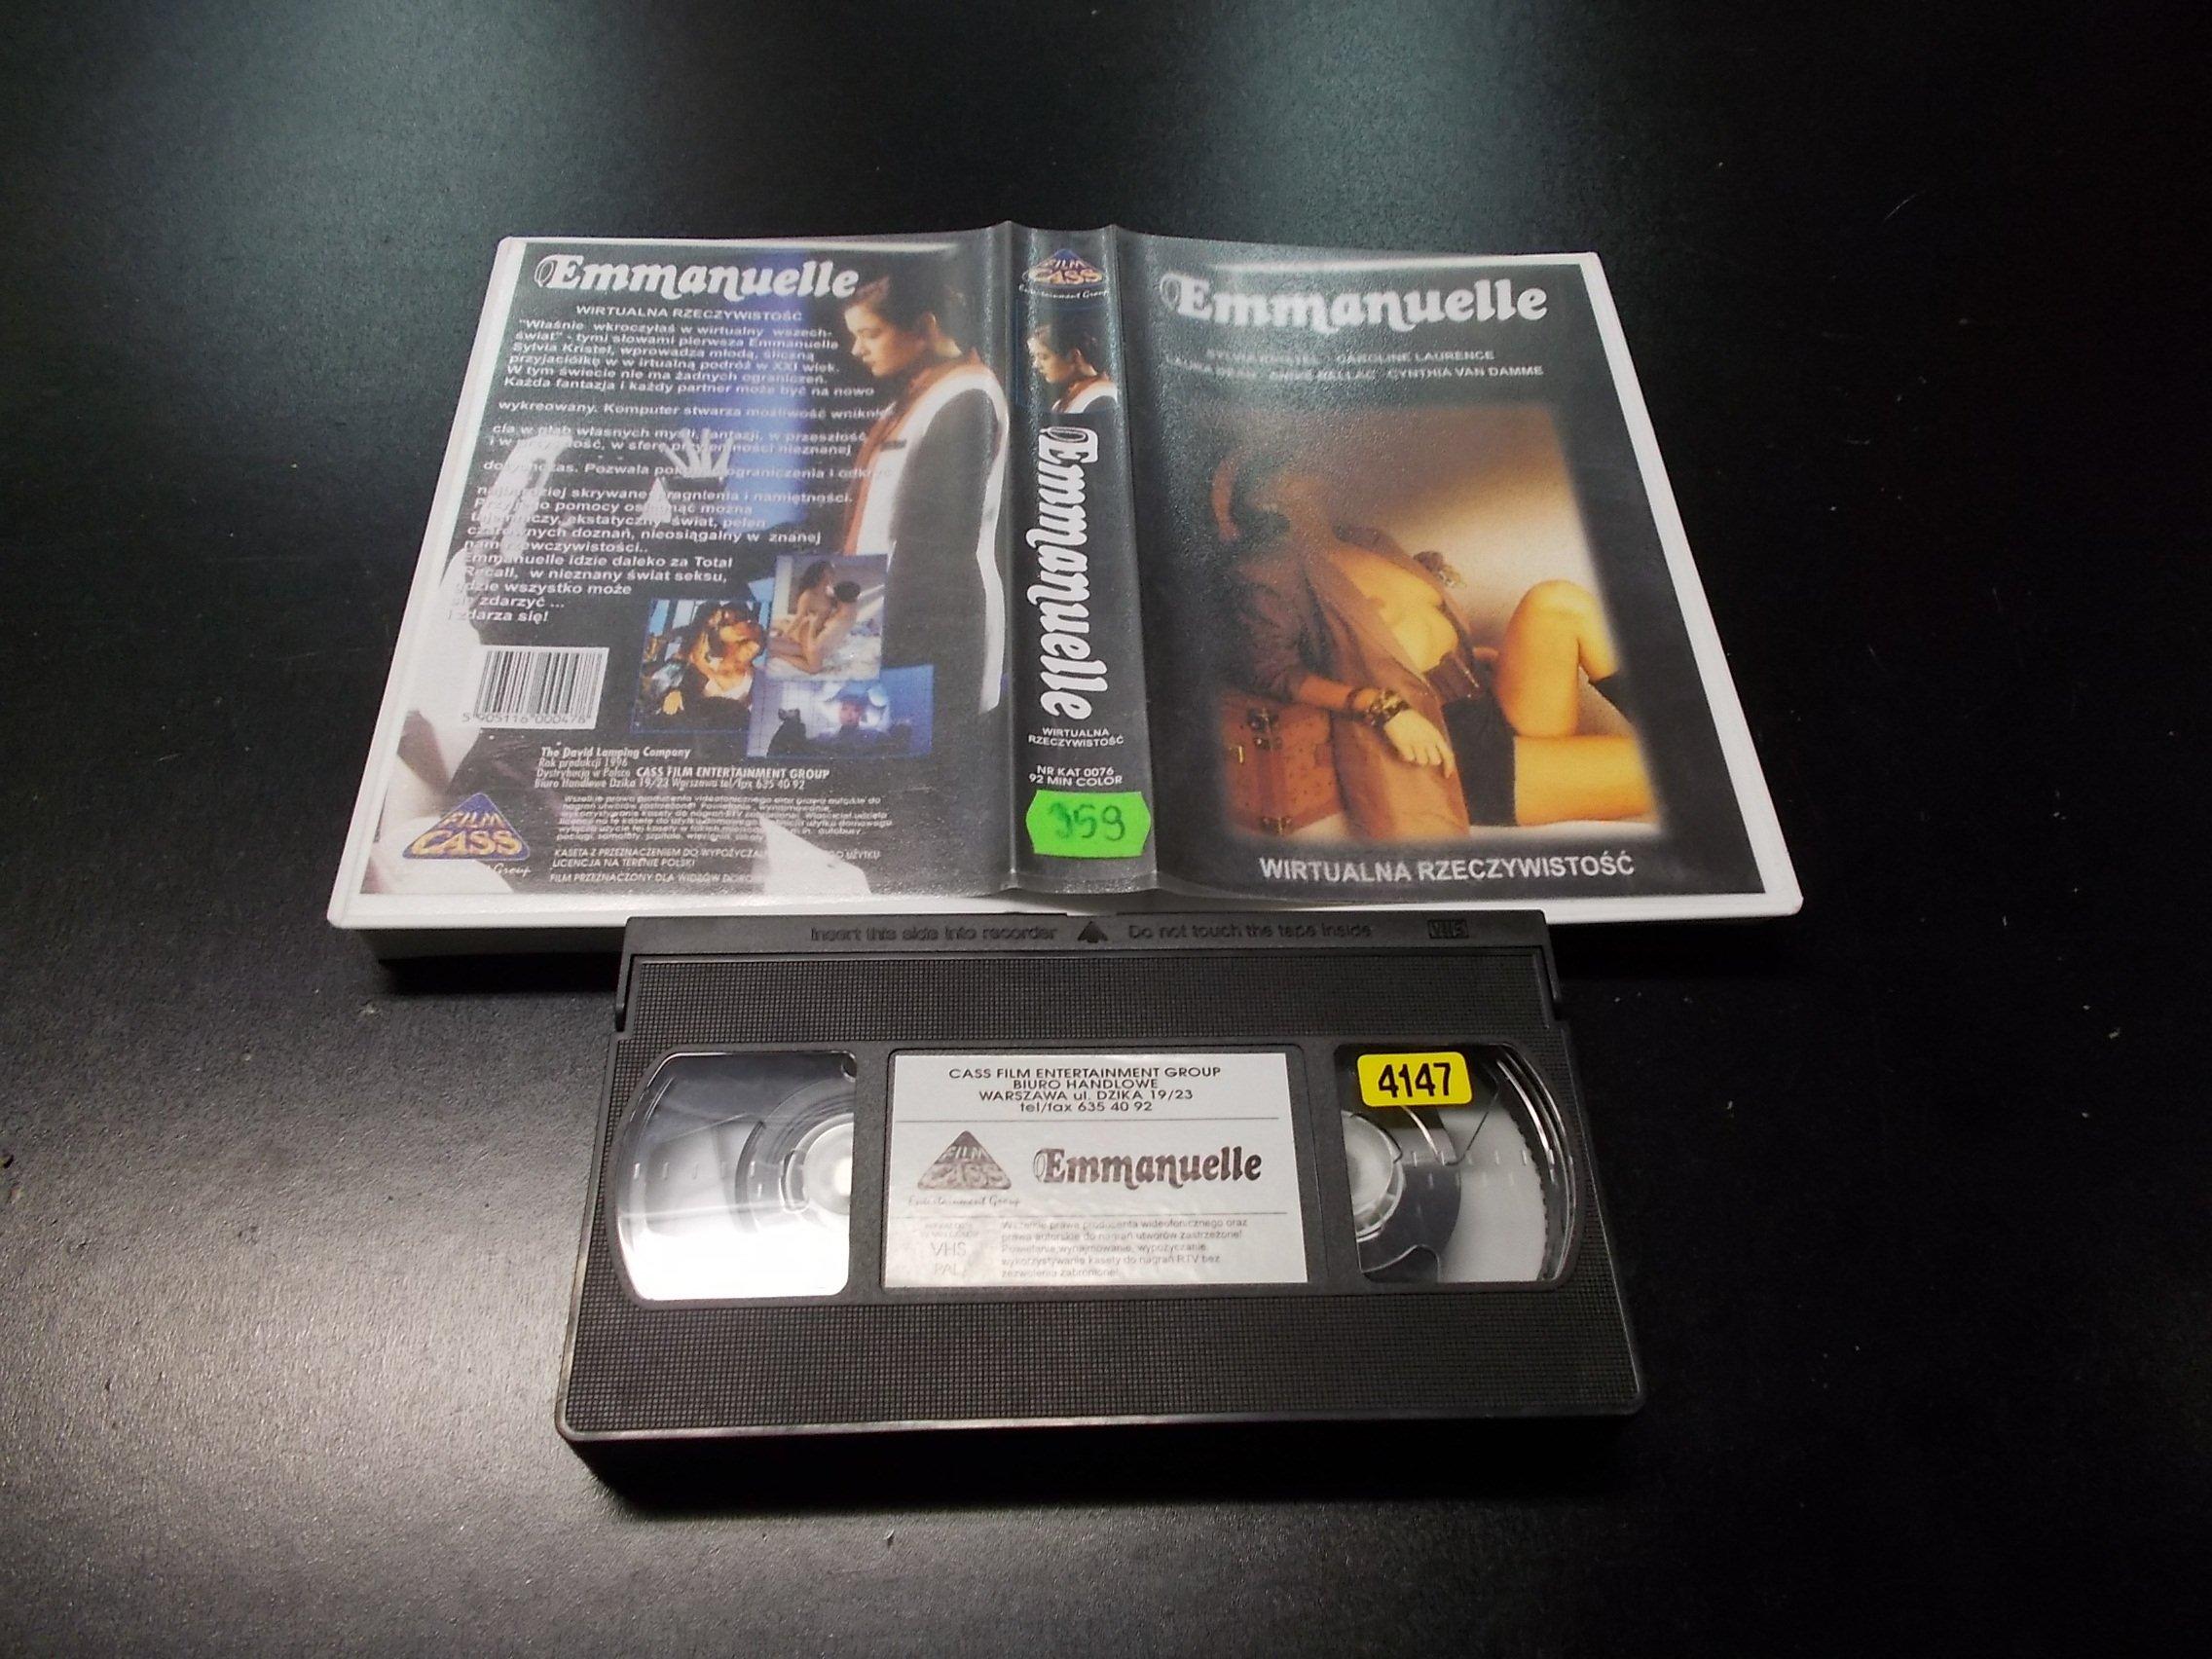 EMMANUELLE -  kaseta VHS - 1207 Opole - AlleOpole.pl